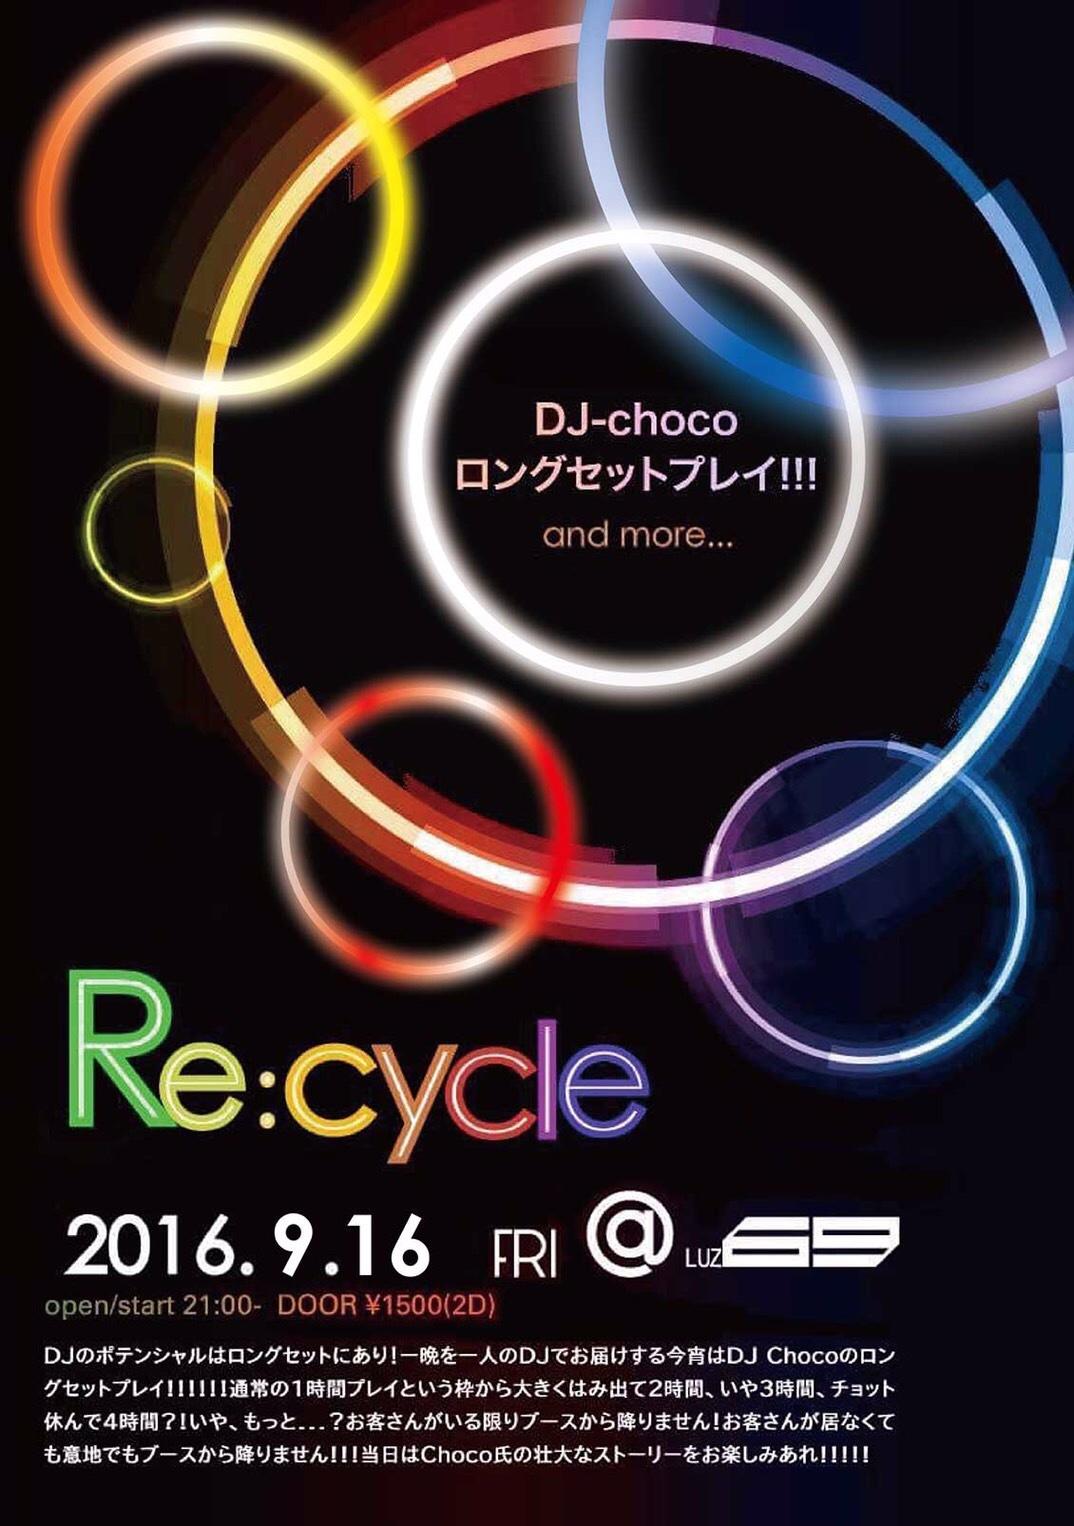 Re:cycle vol.2  (2016.9.16 @LUZ69) レポ_e0115904_15040035.jpg